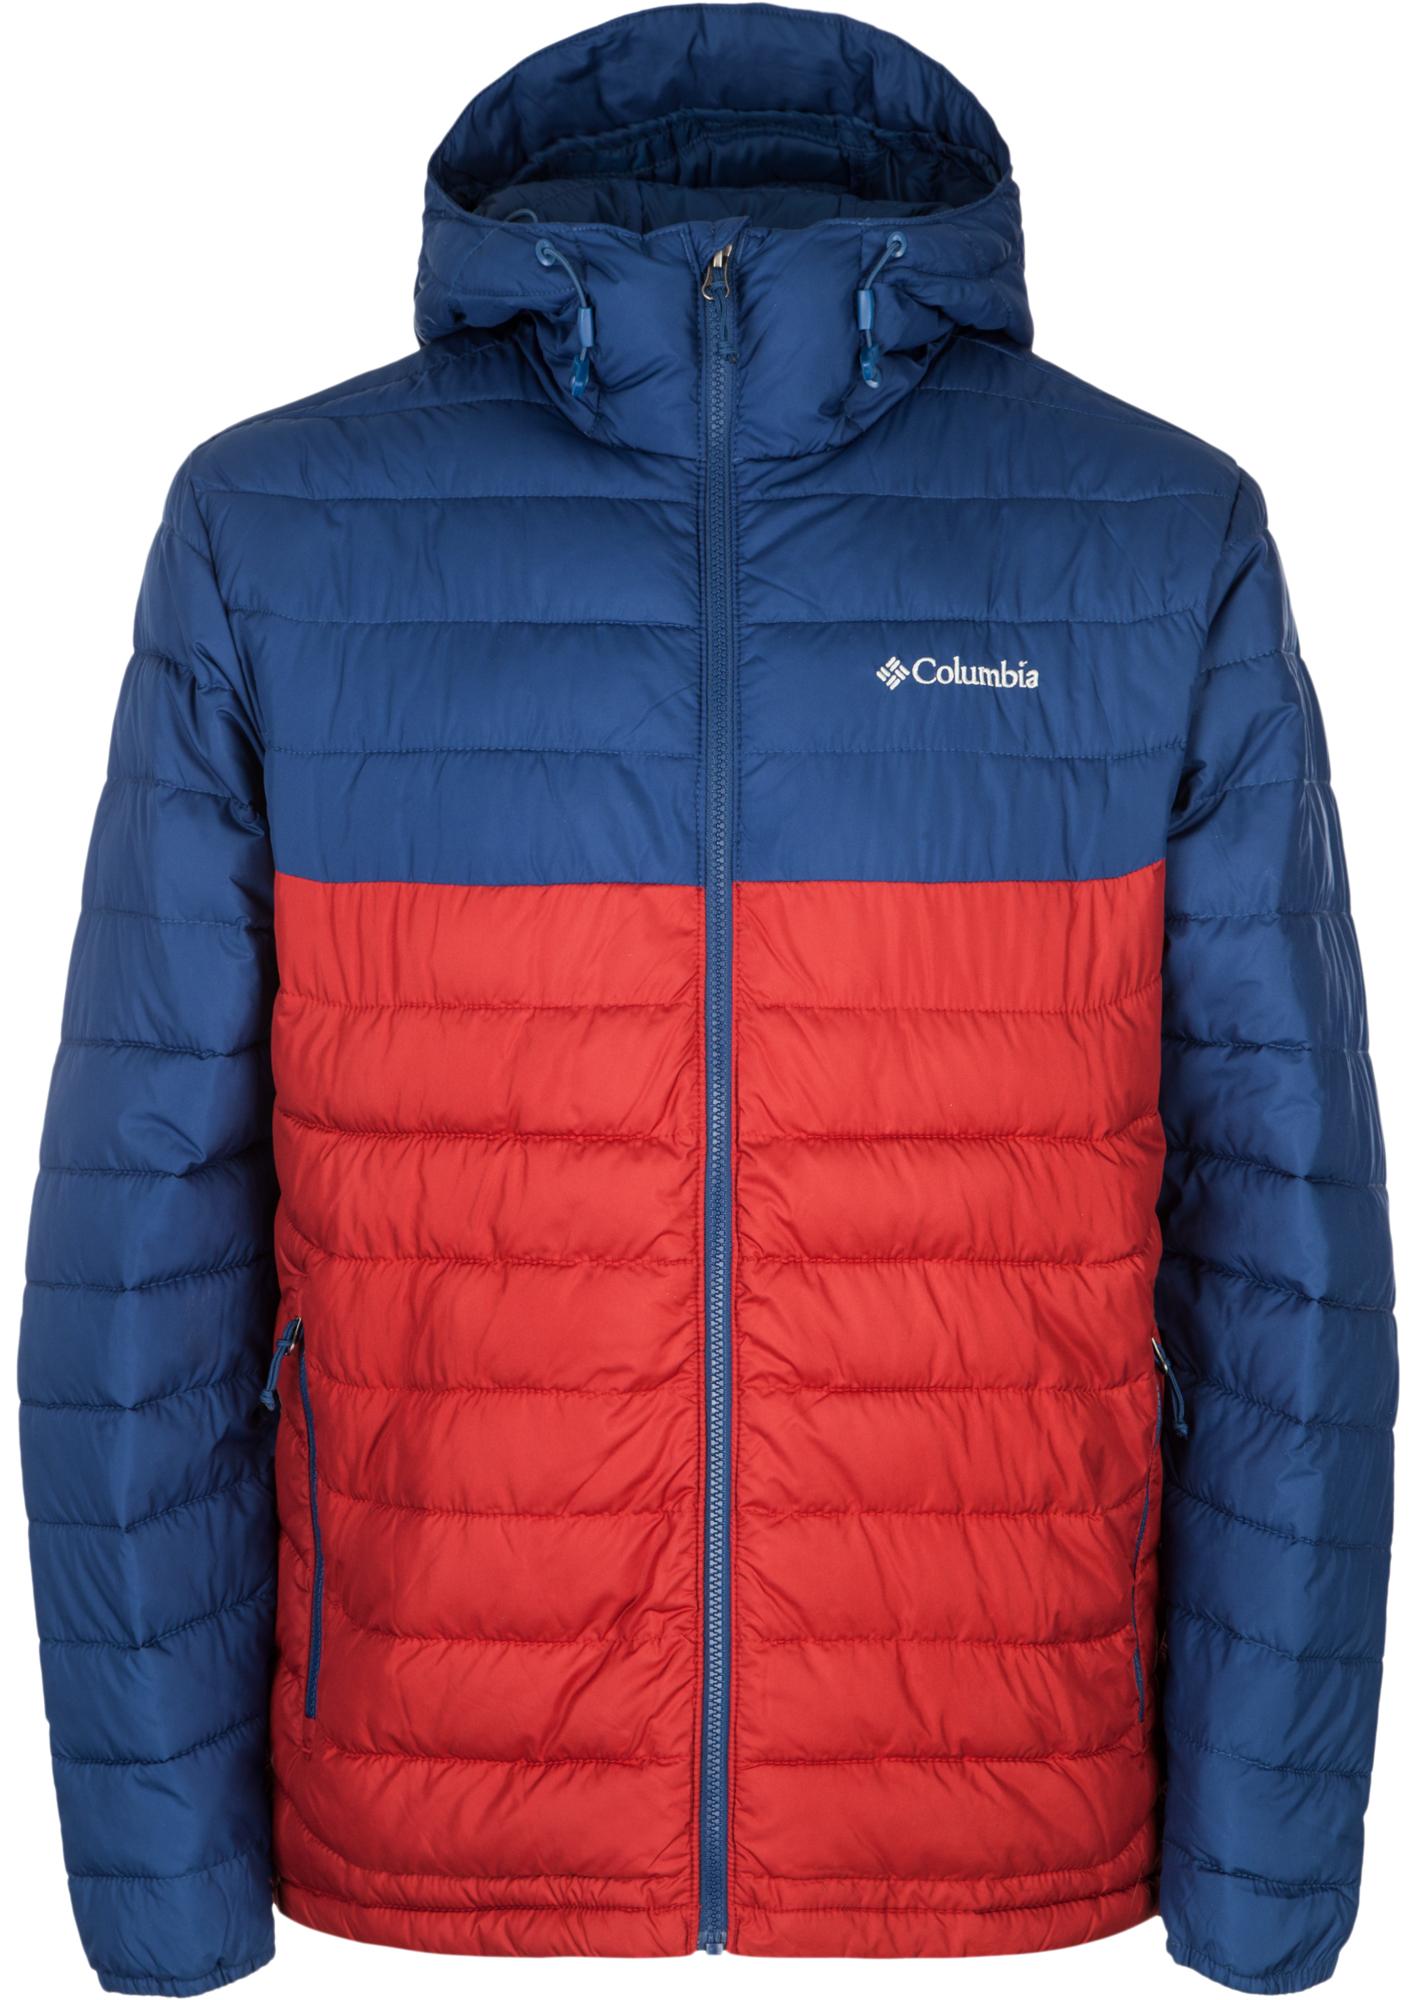 Columbia Куртка утепленная мужская Columbia Powder Lite